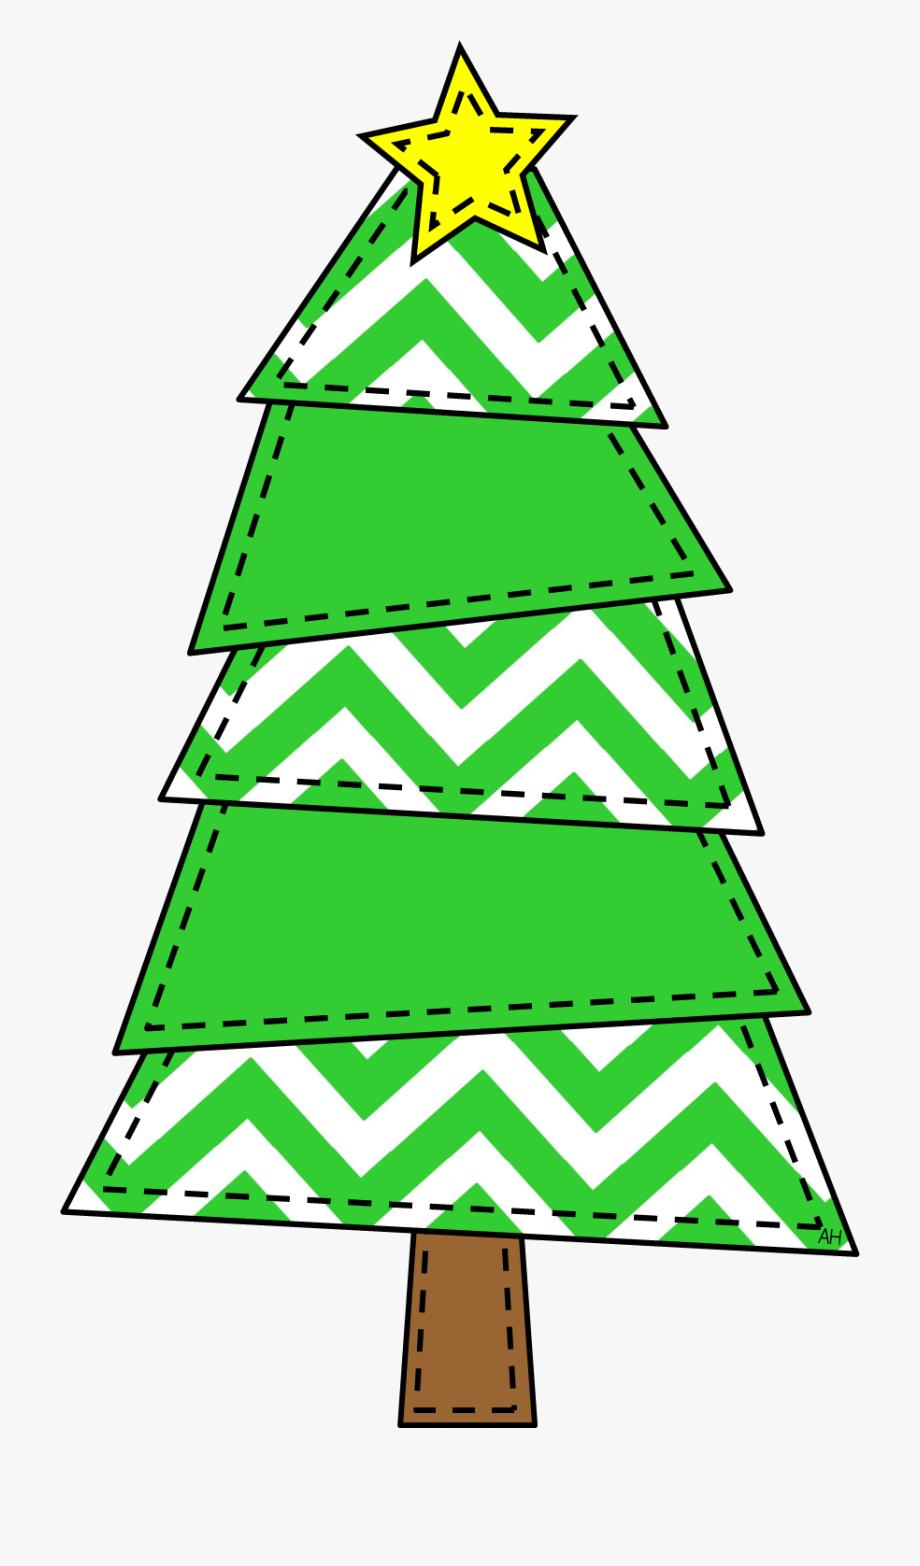 Free image dj inkers. December clipart christmas tree